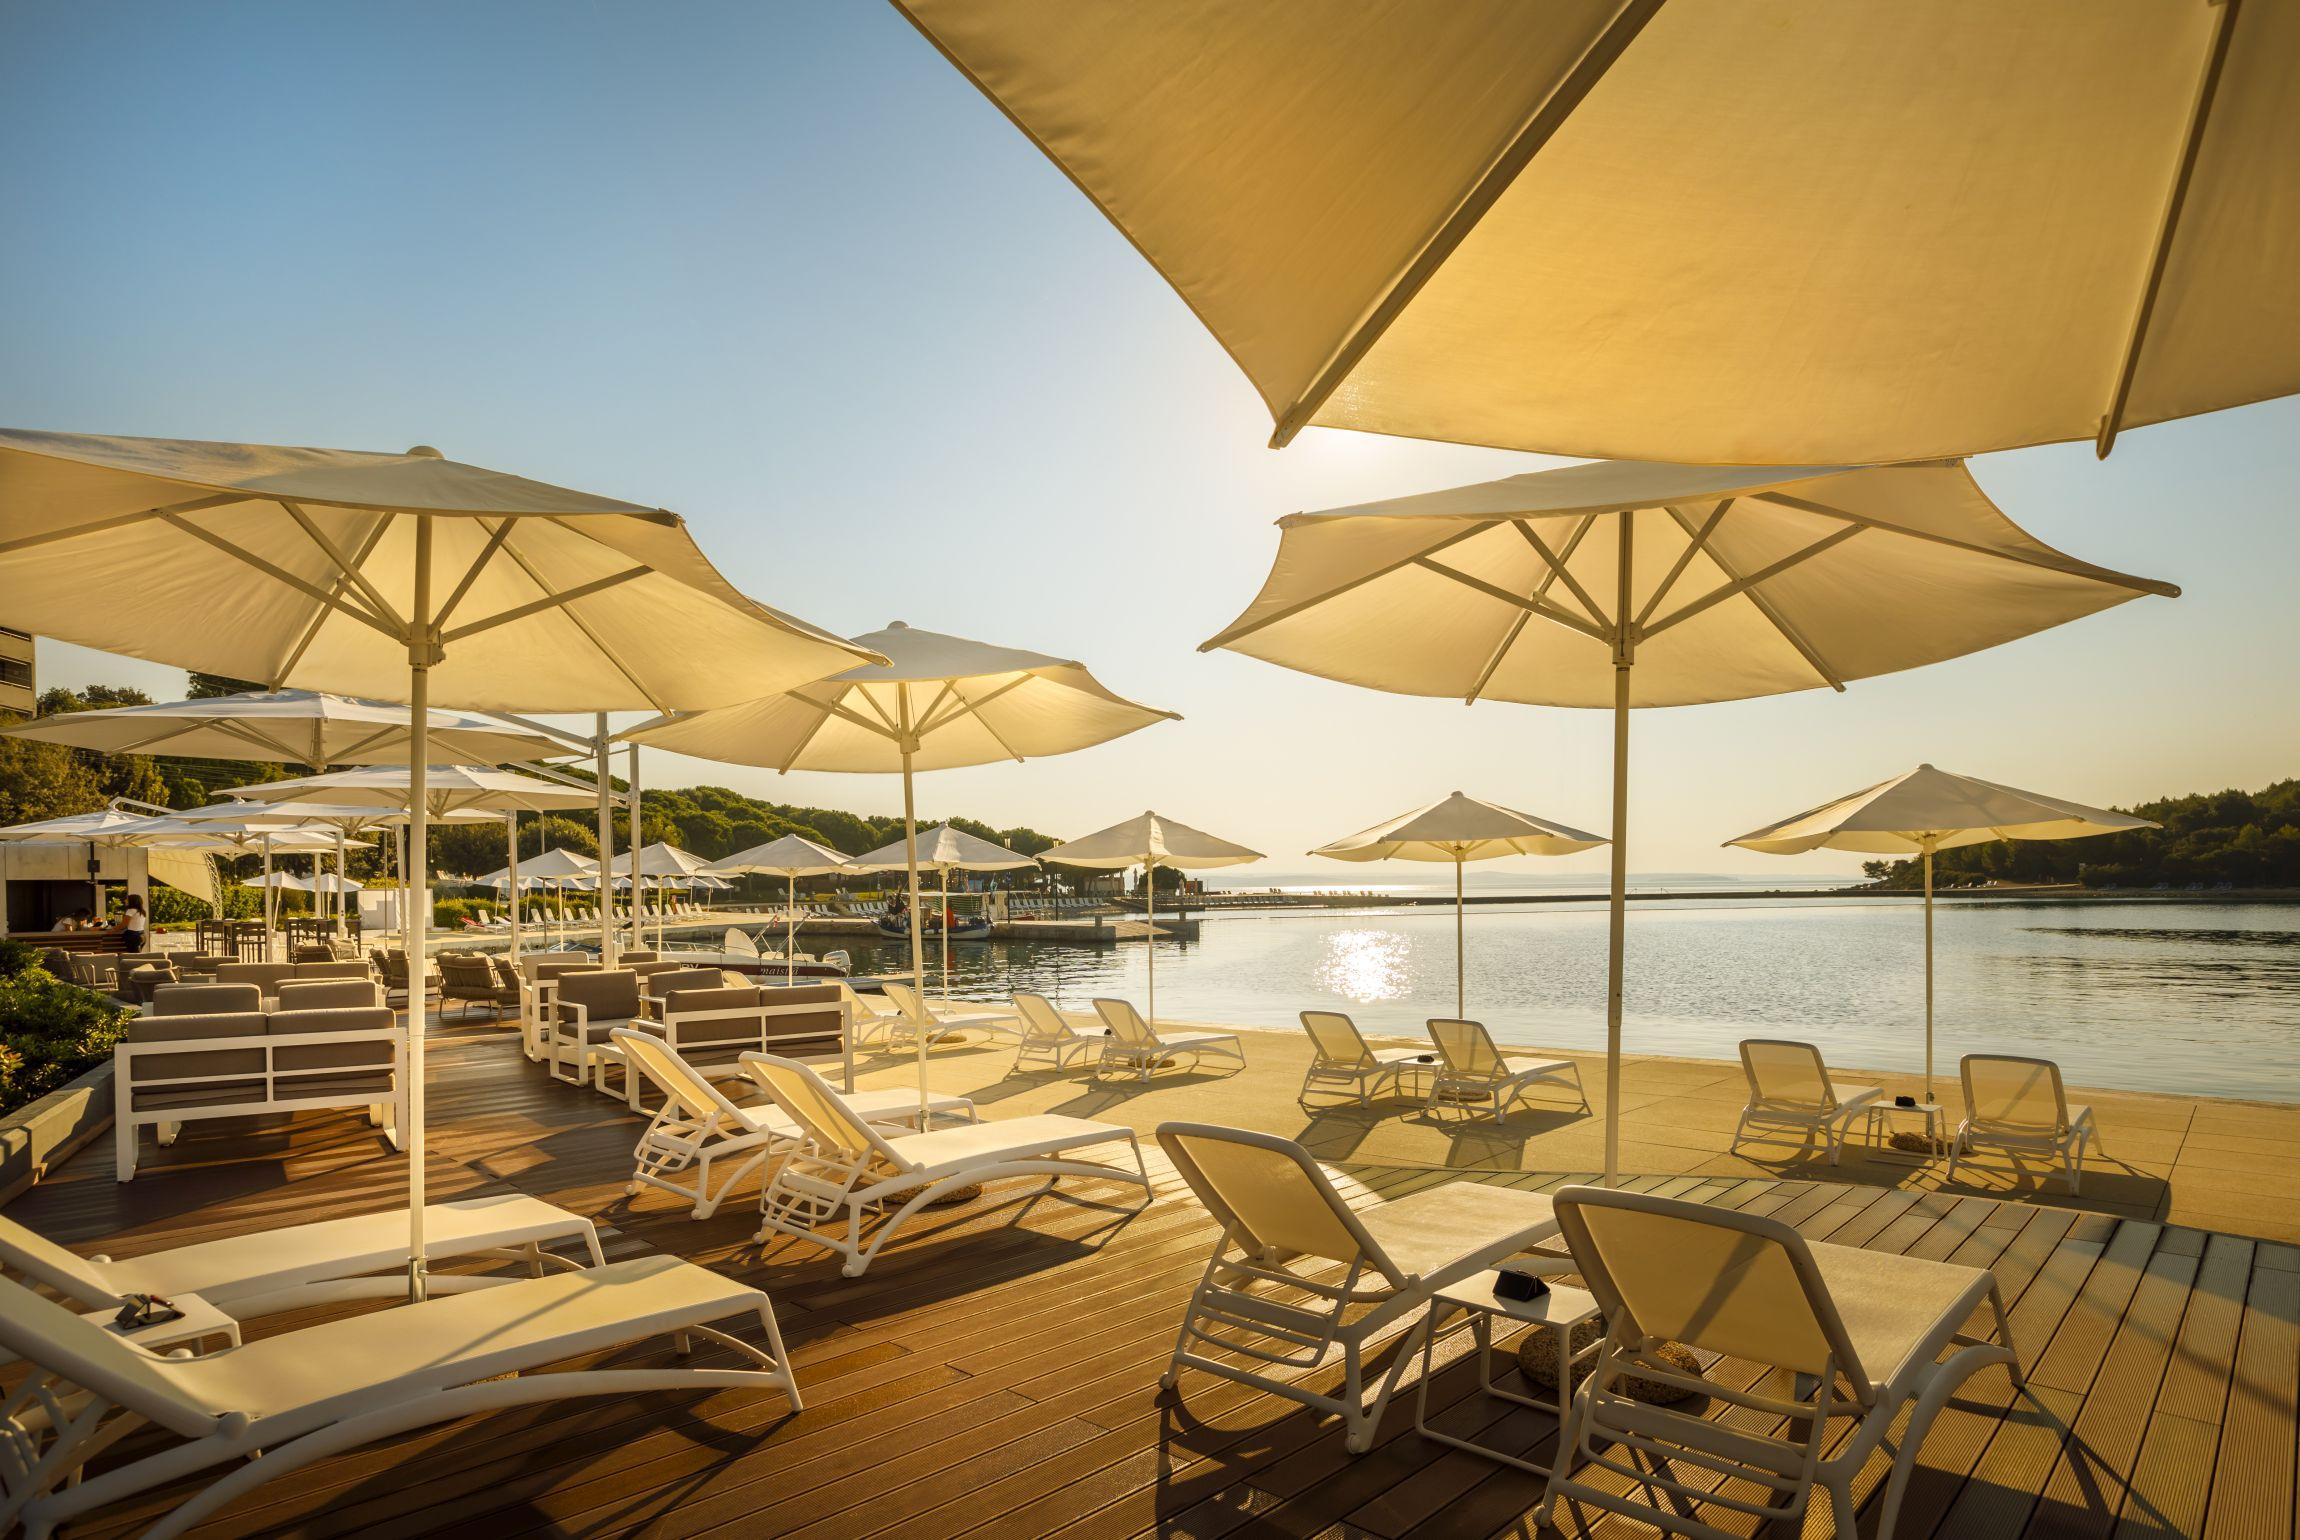 Hotel Istra (16)